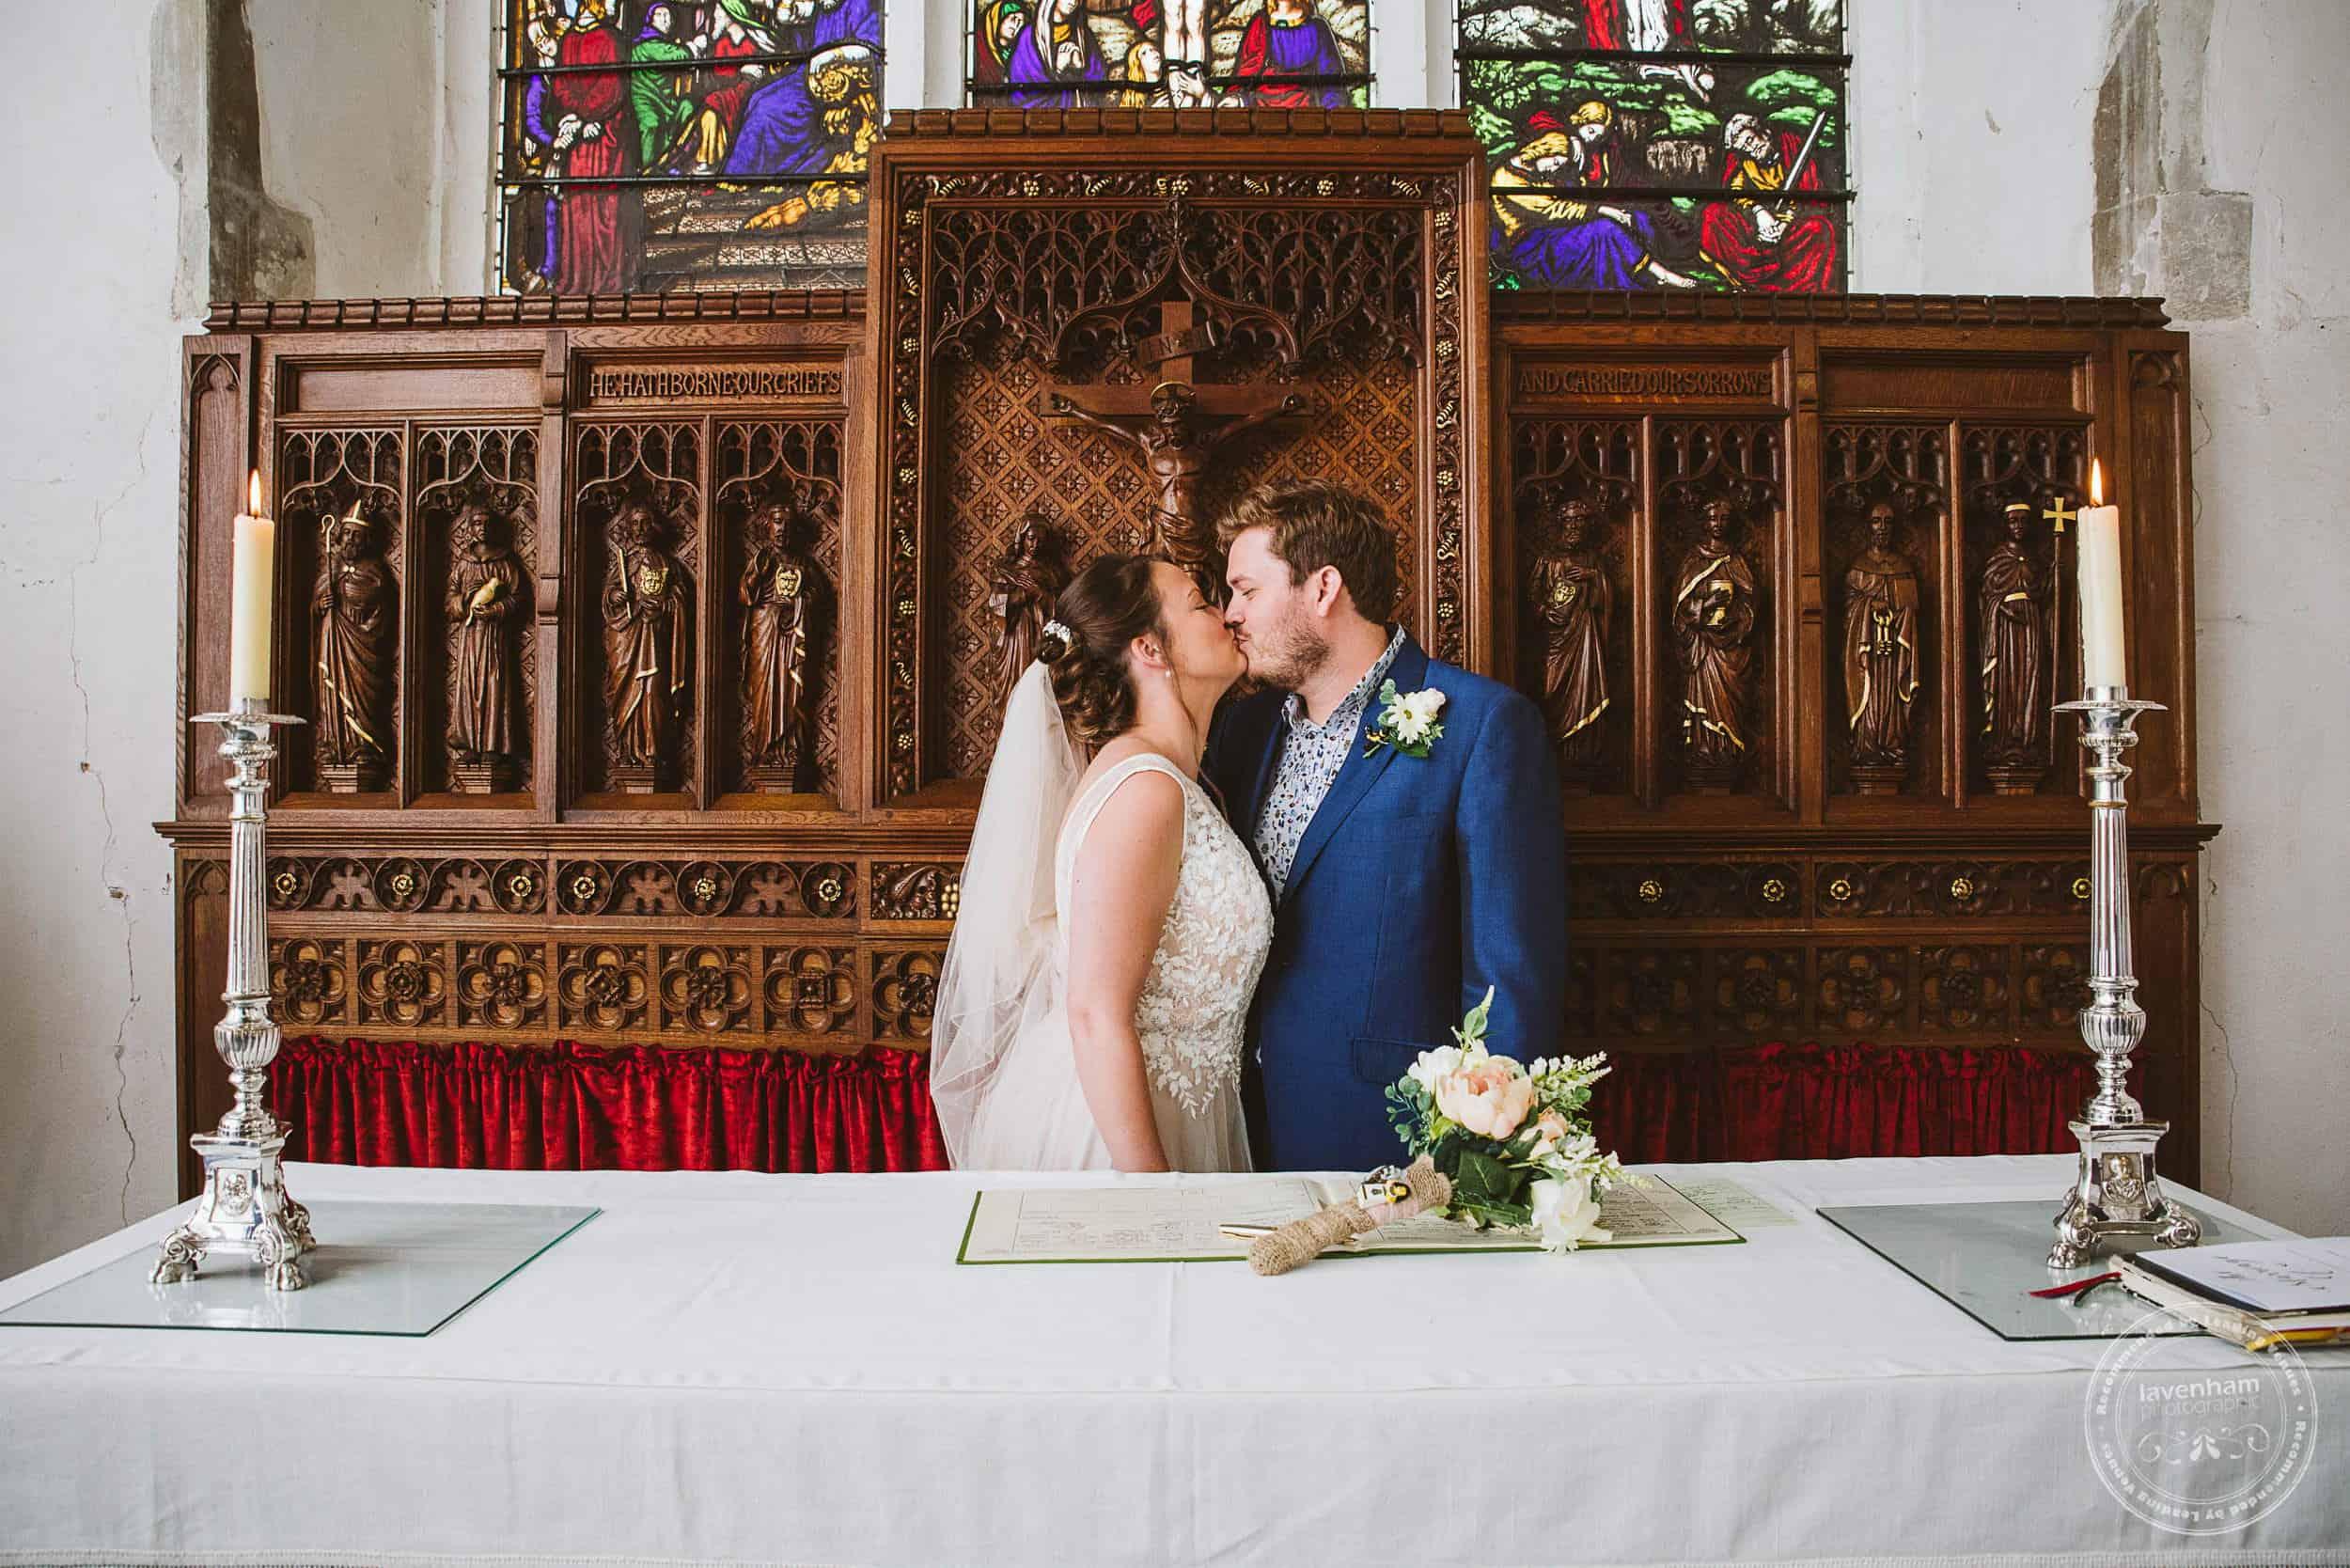 180818 Marks Hall Wedding Photography Lavenham Photographic 063